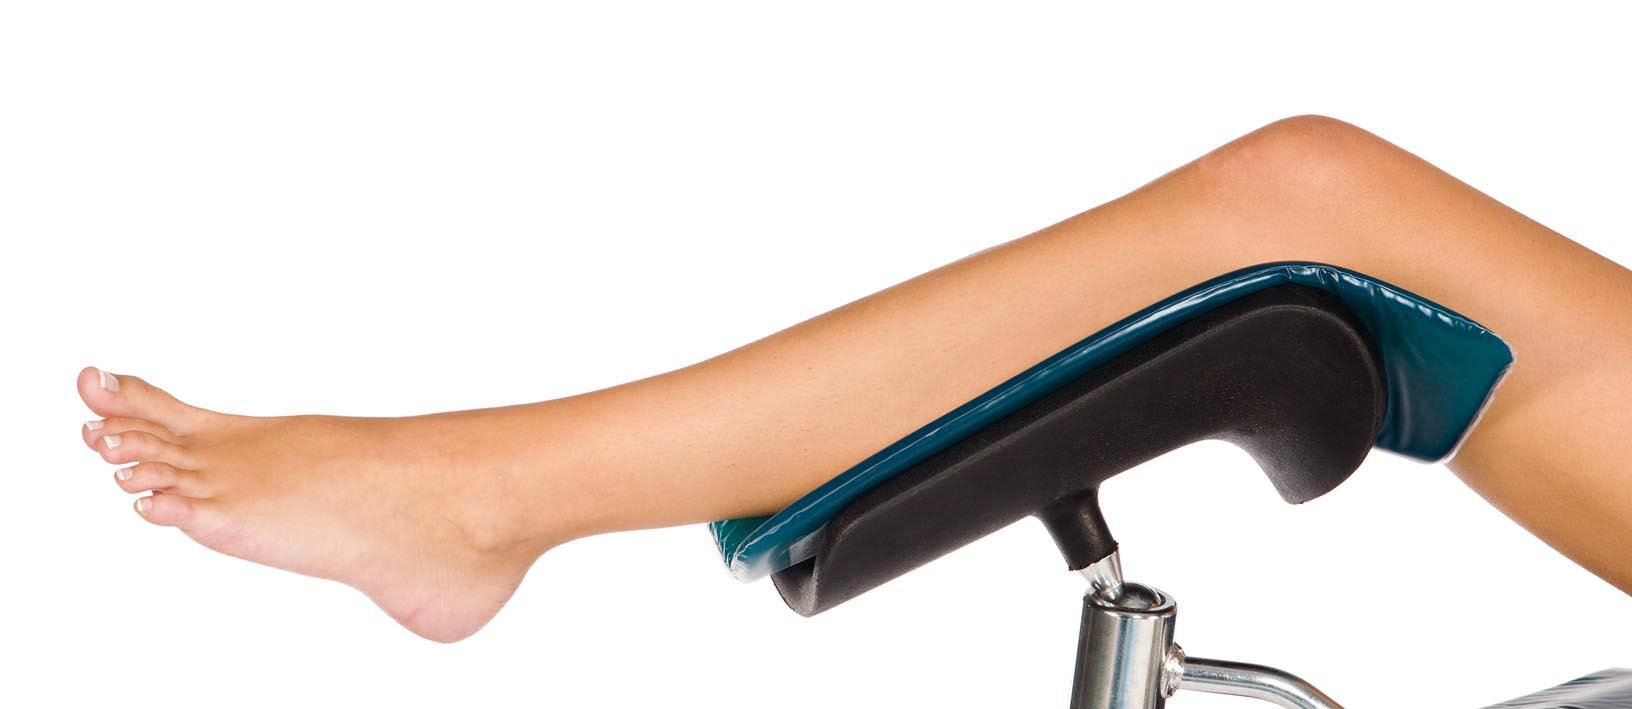 Oasis Crutch Stirrup Pad (OA092) - Adolescent / Adult - 520 x 300 x 10mm